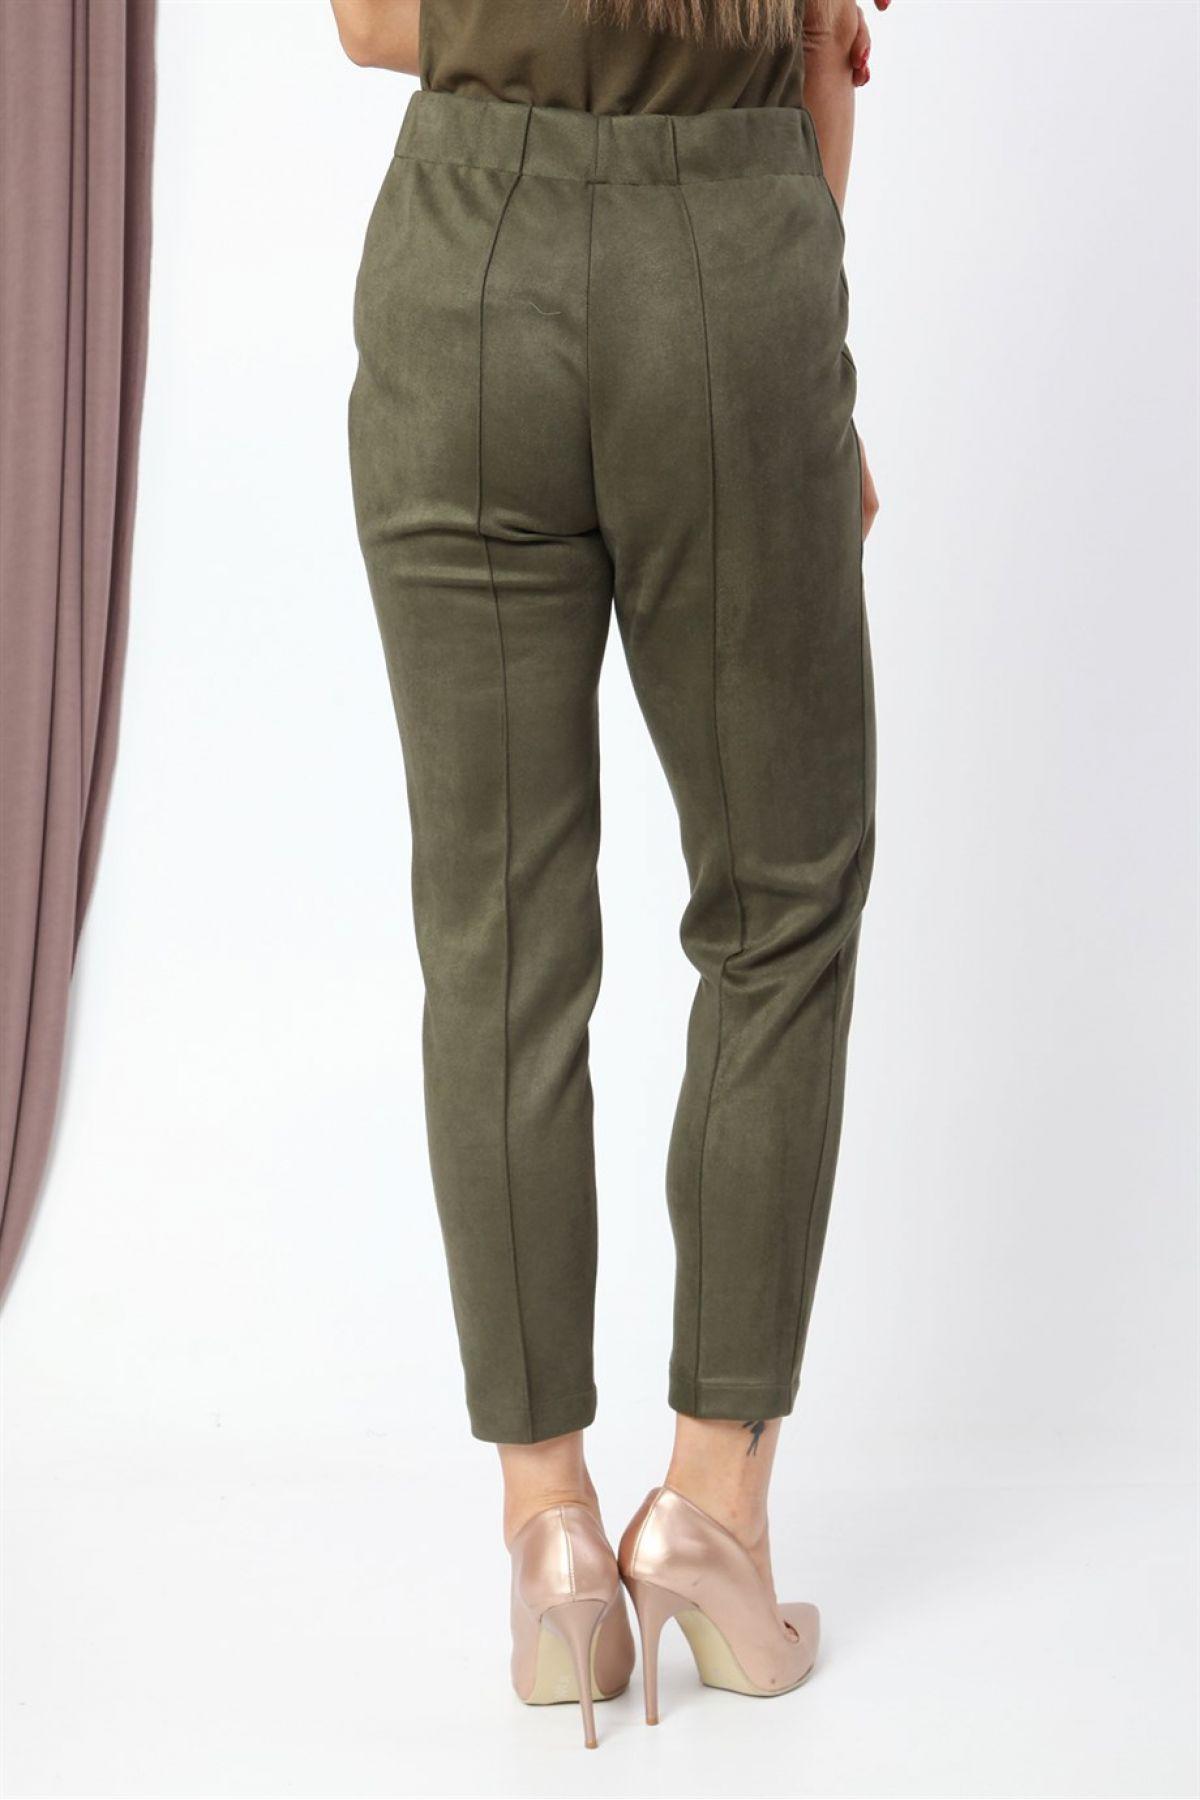 Leggings-Khaki